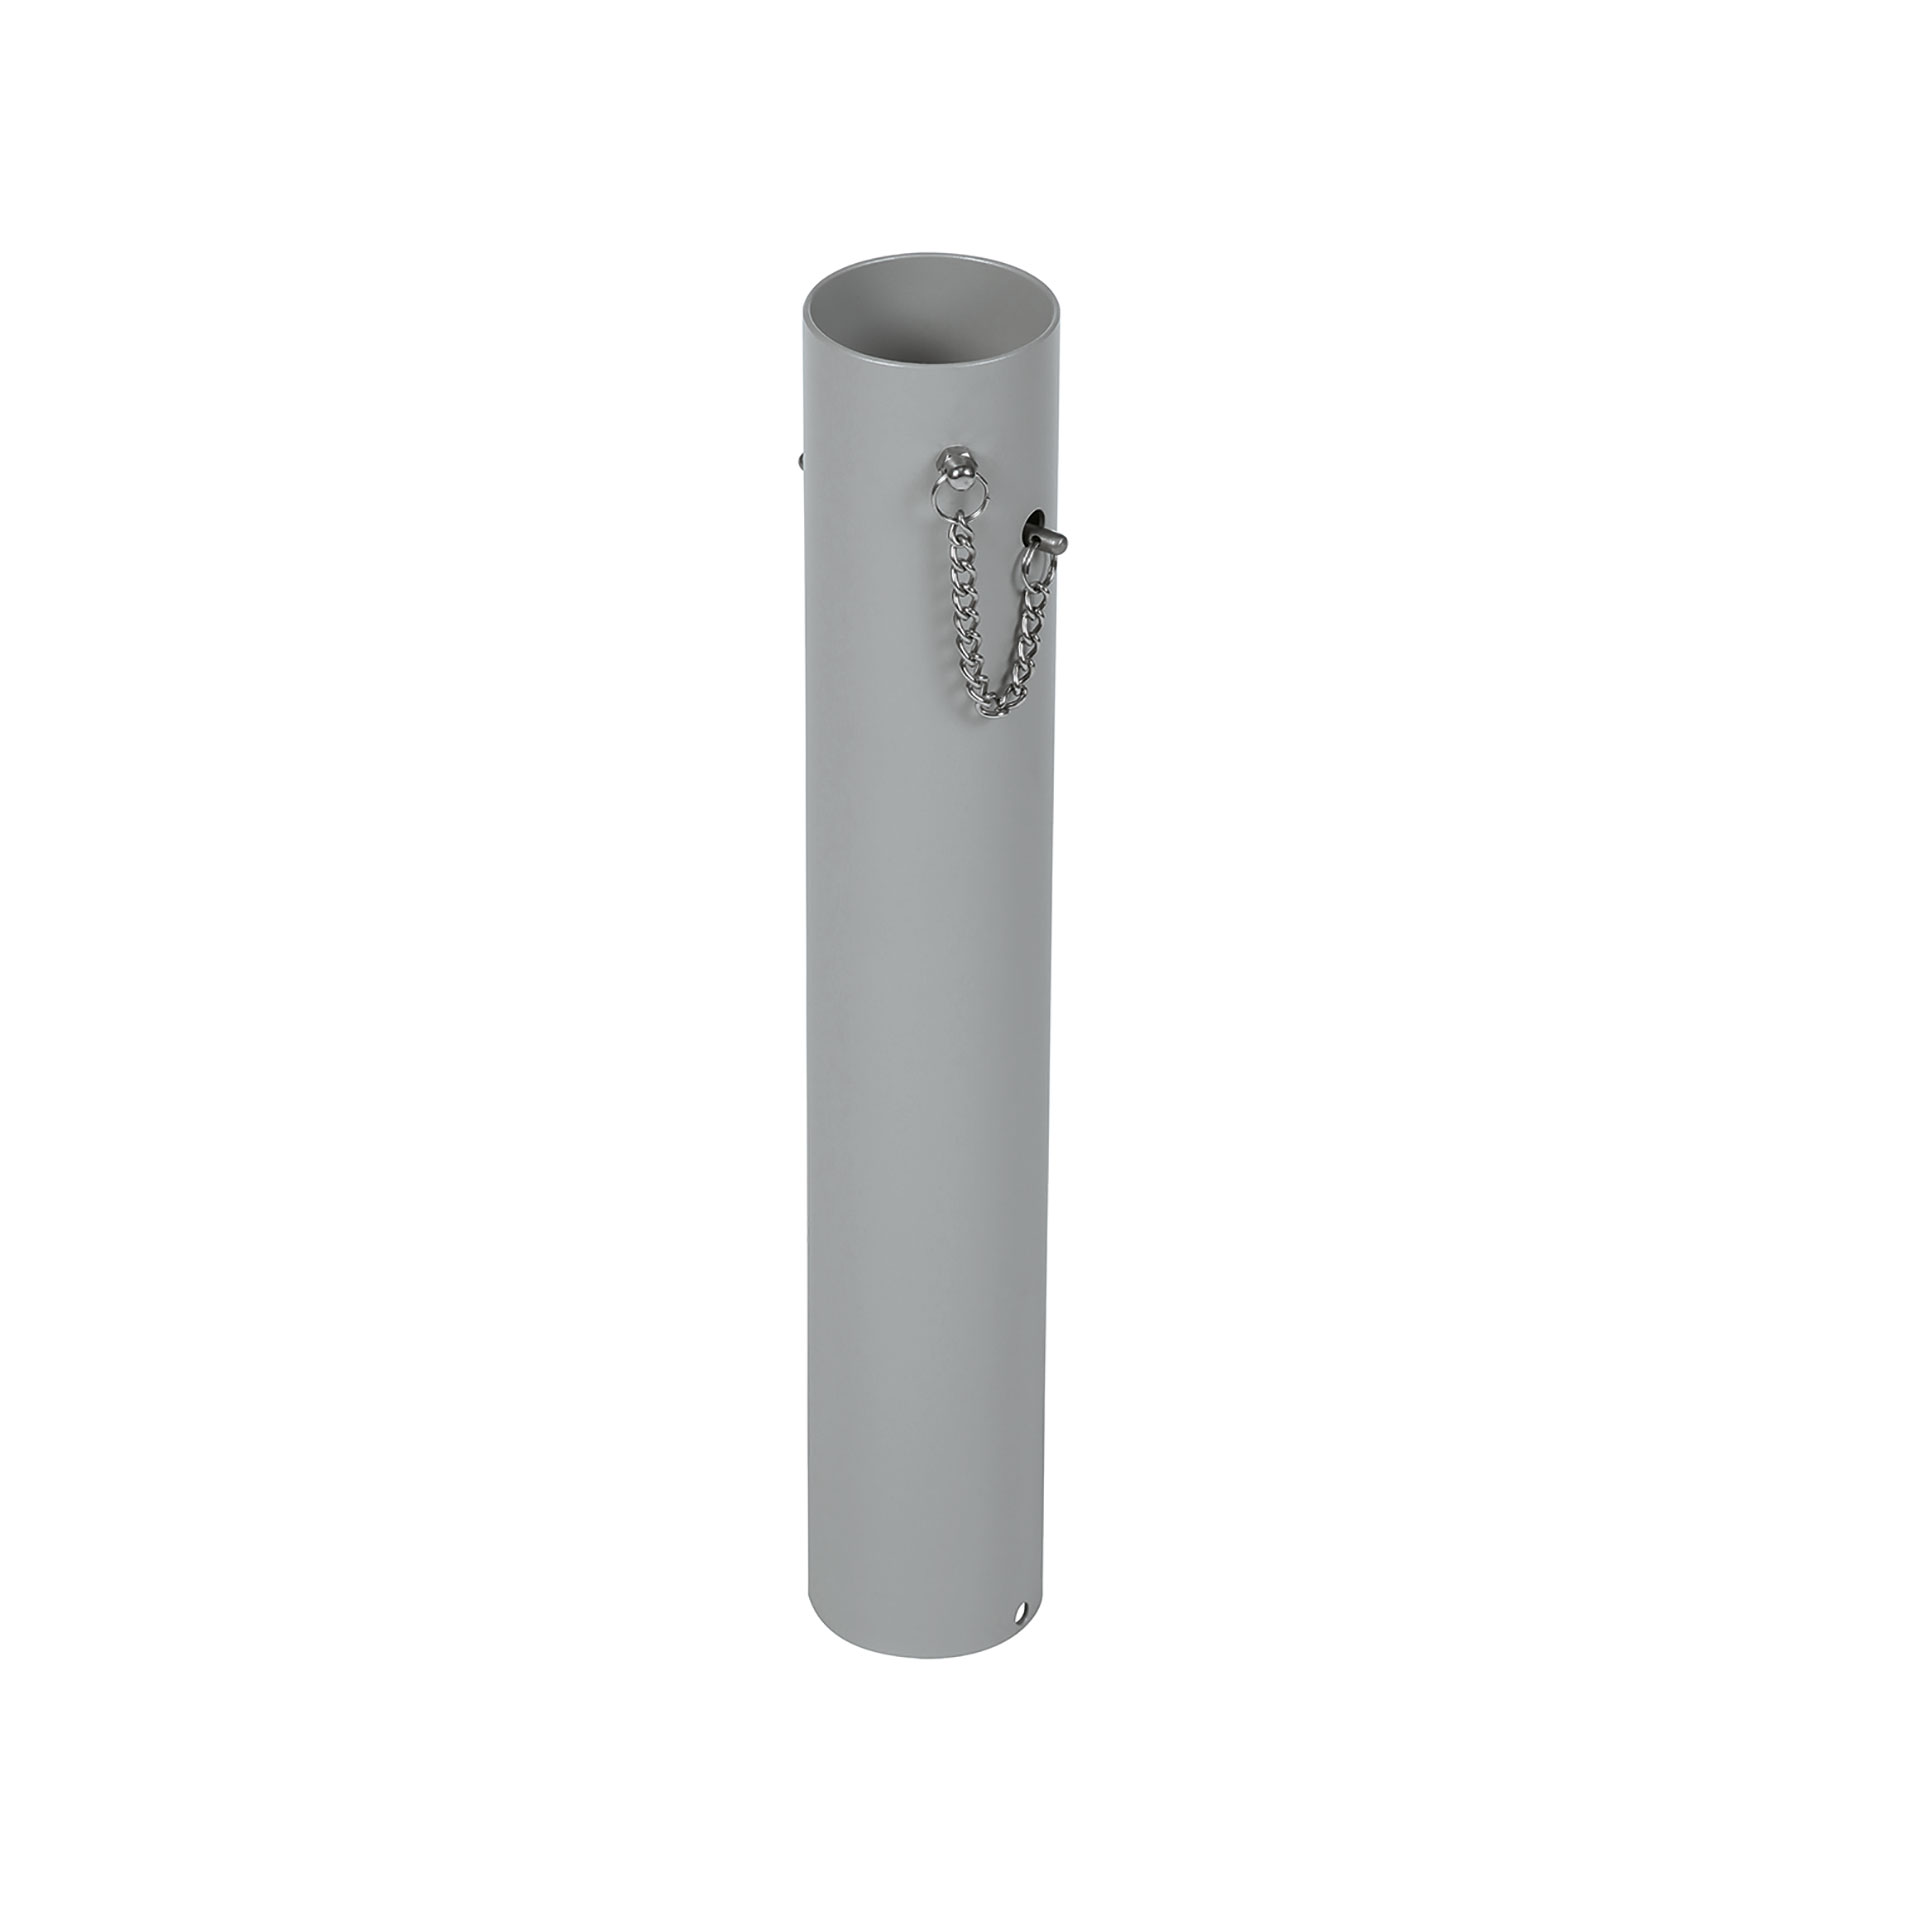 Barlow Tyrie 2 5inch Diameter Large Umbrella Base Tub